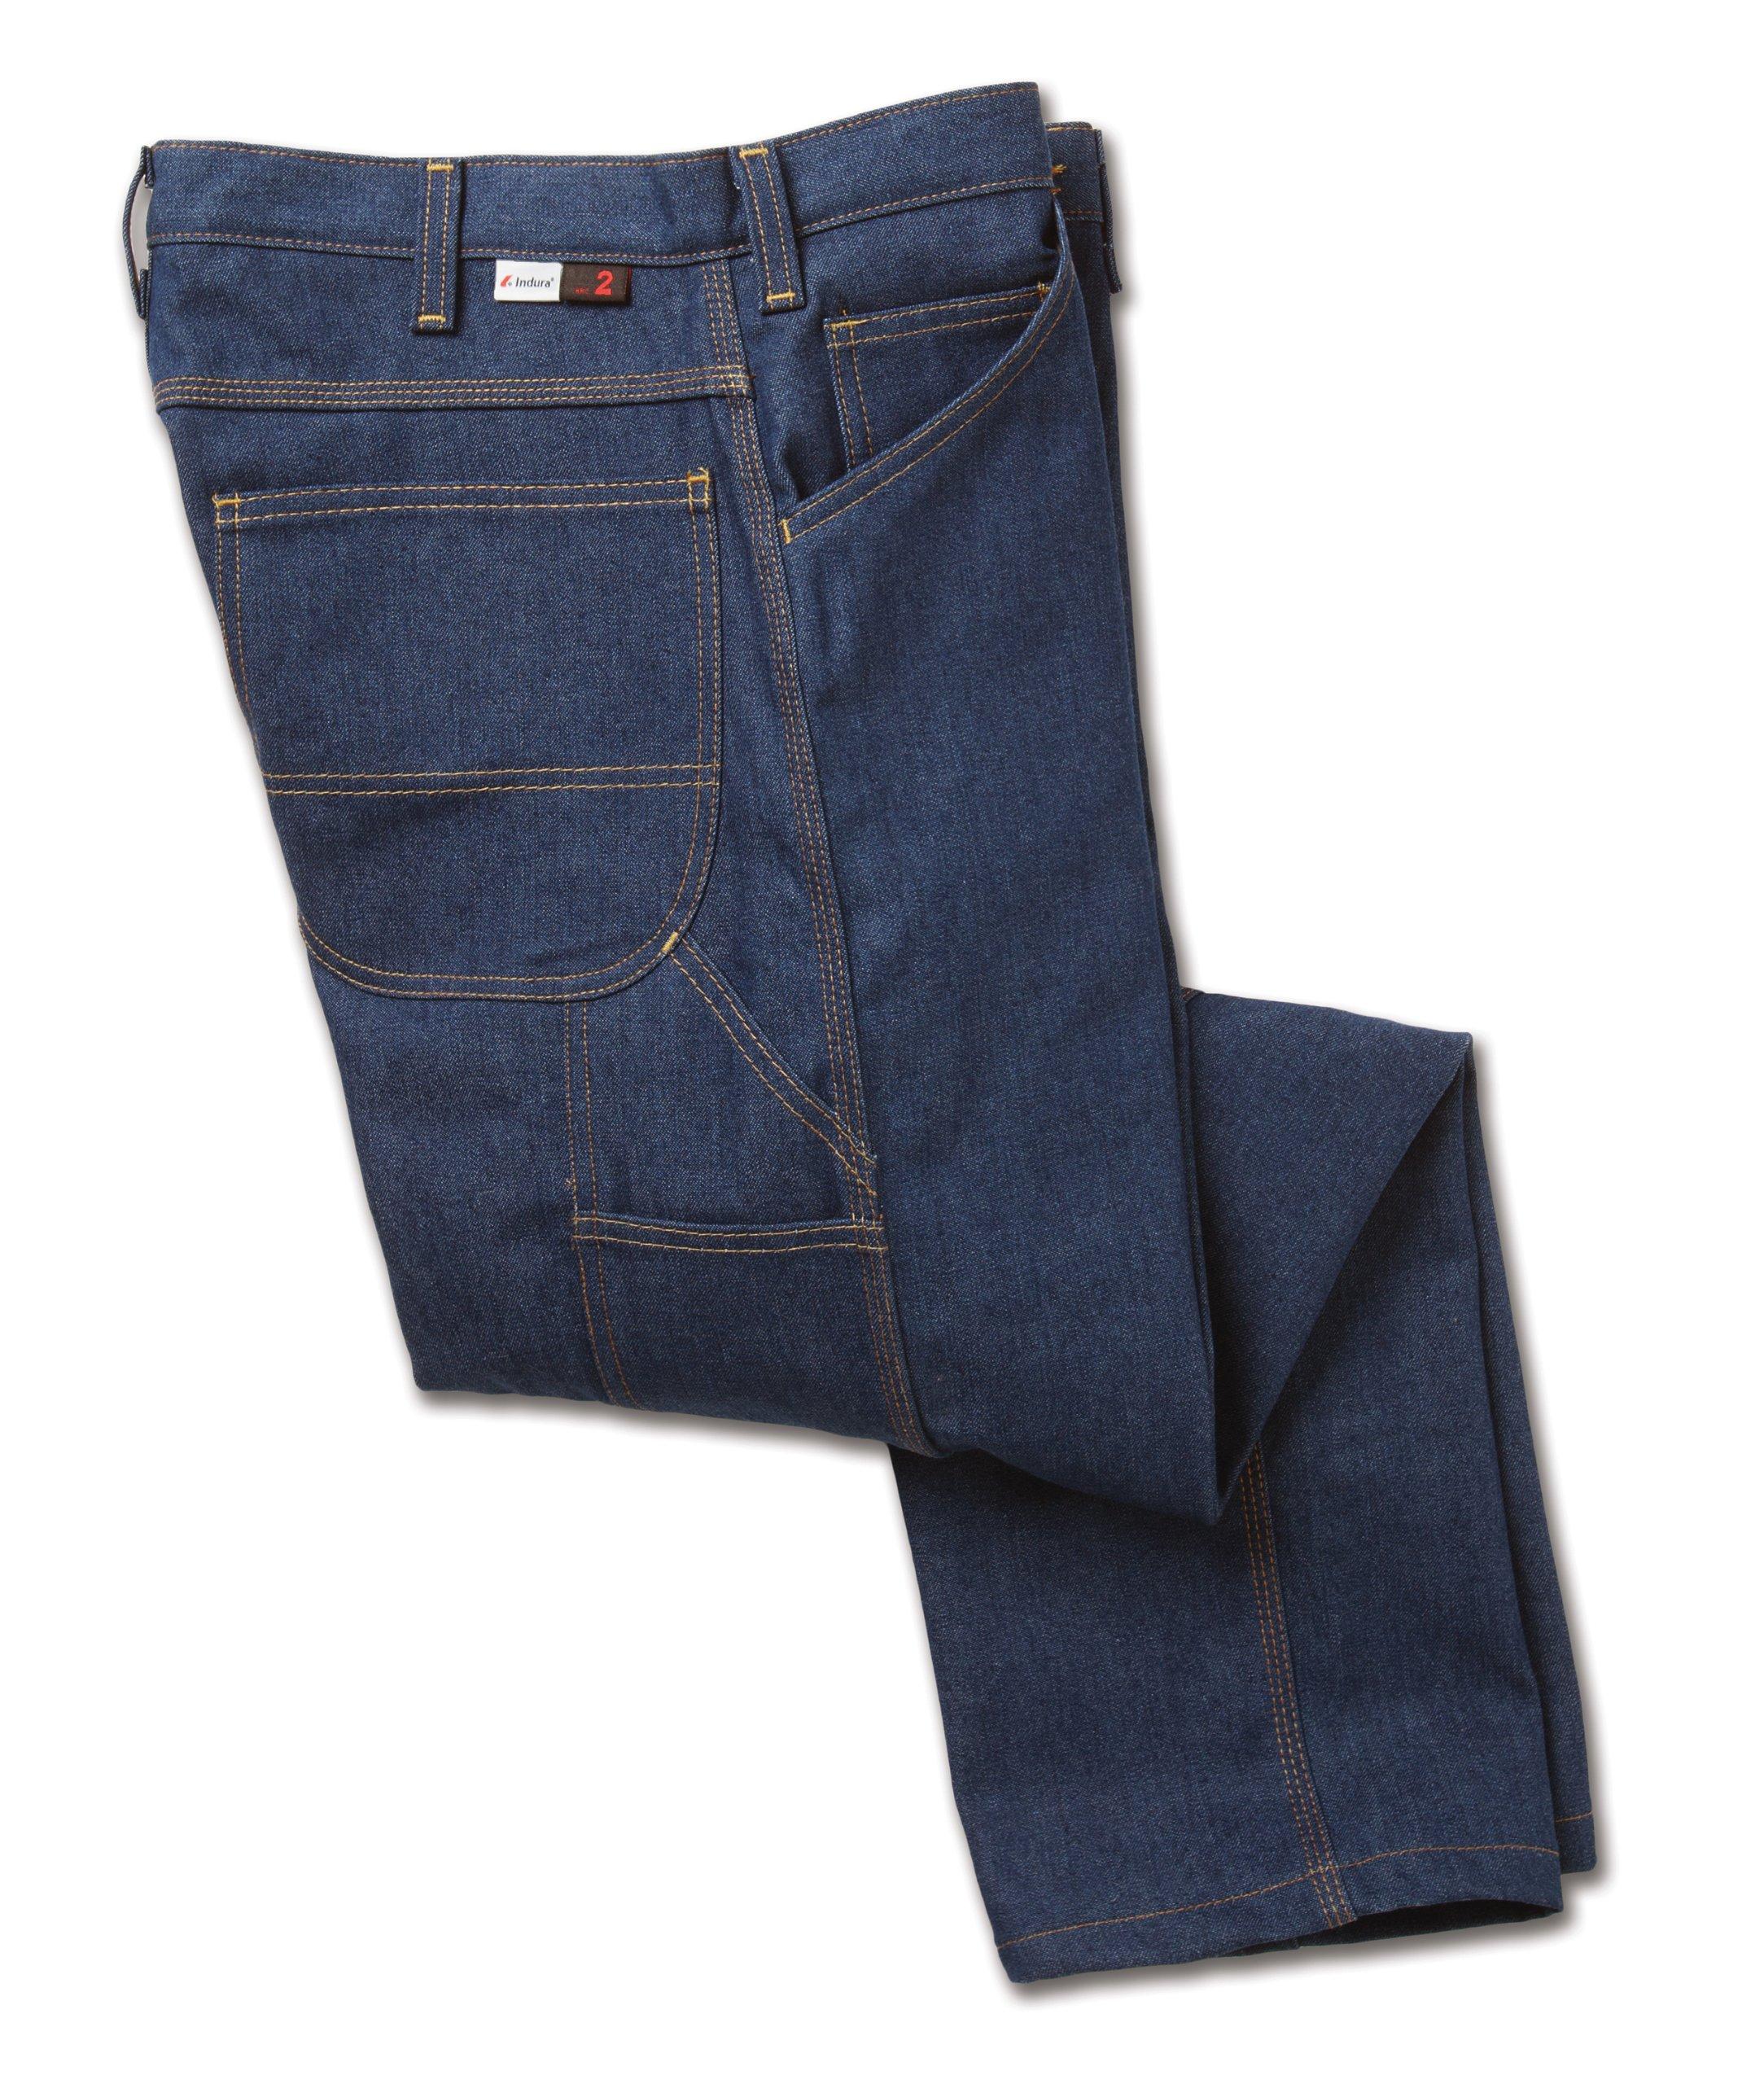 Workrite 496ID12SD38-30 Flame Resistant 12 oz Indura Carpenter Jean Pant, 38 Waist Size, 30 Inseam, Soft Denim by Workrite (Image #1)